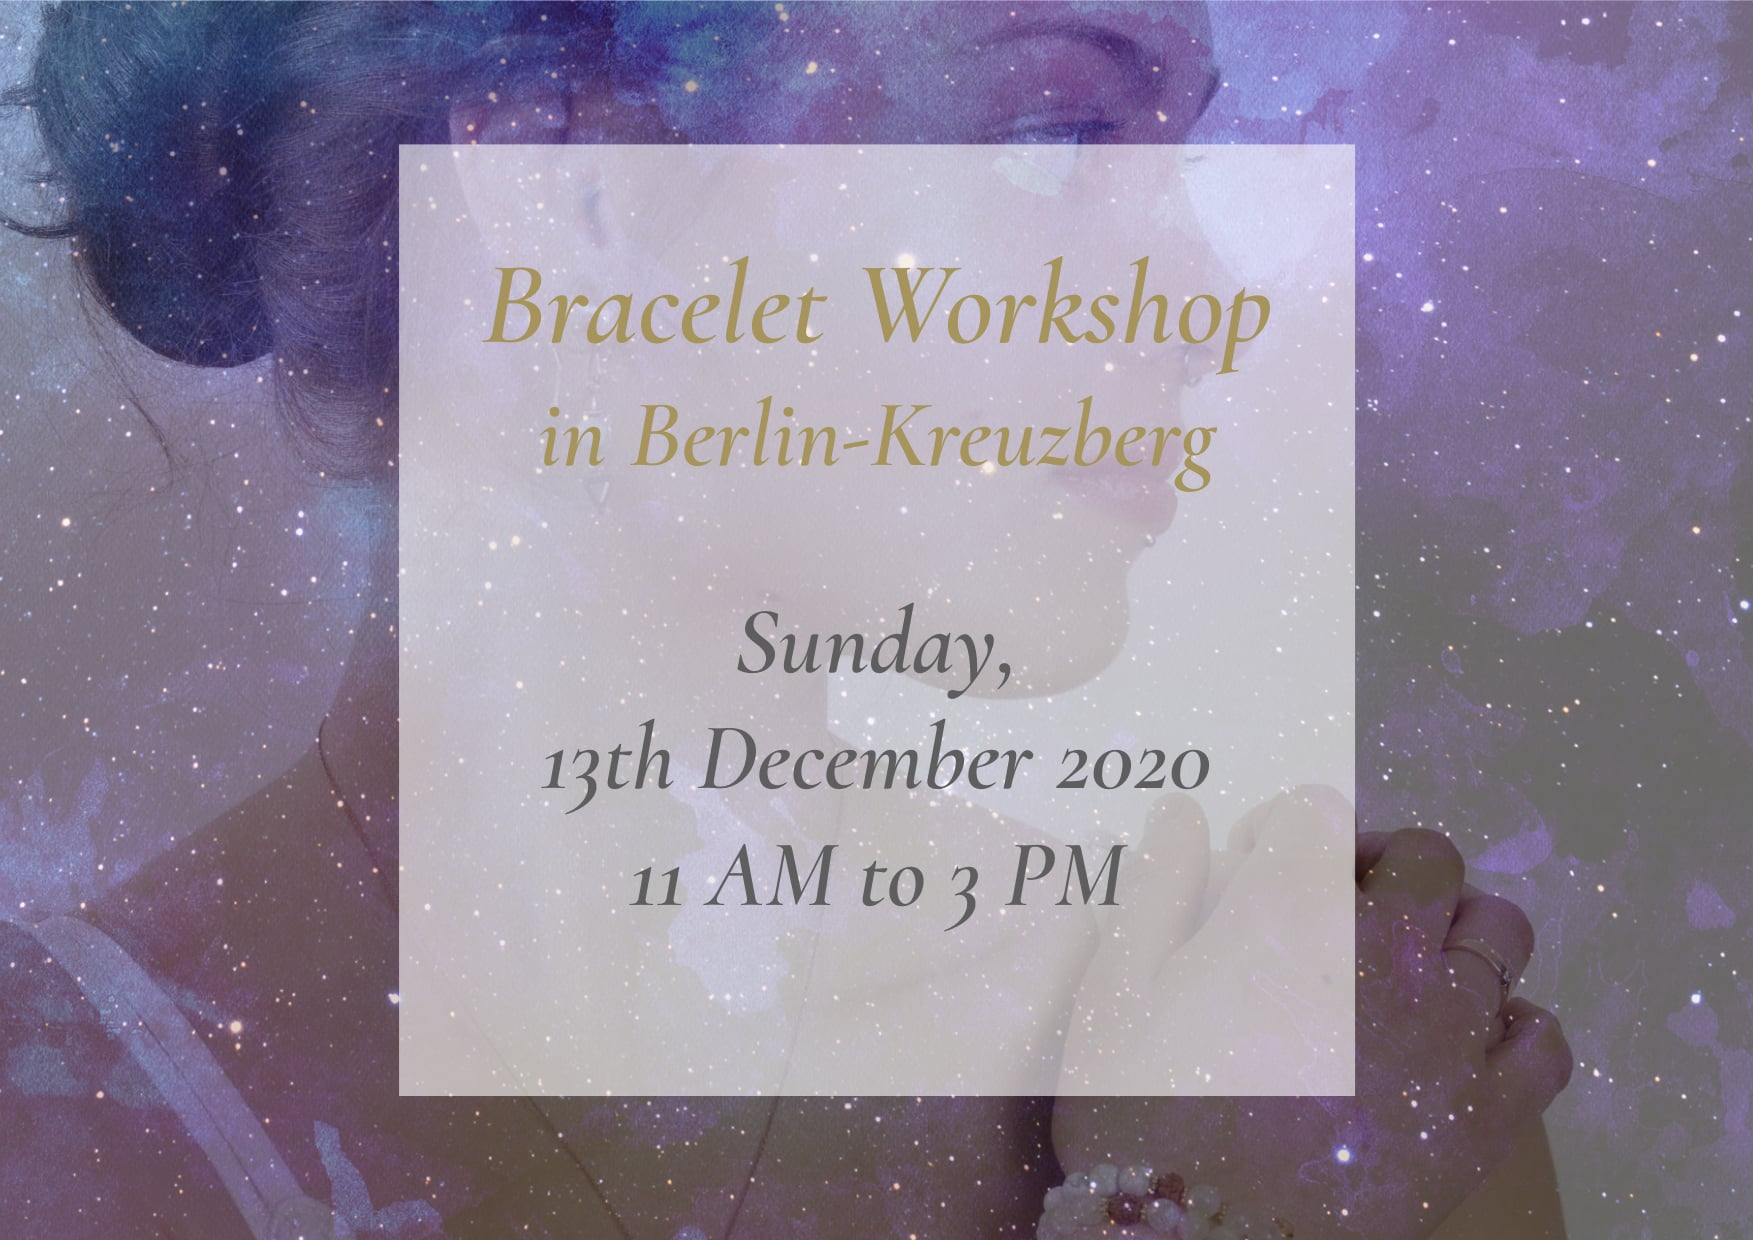 NW_Armband_WS_12_2020_Berlin_2_EN